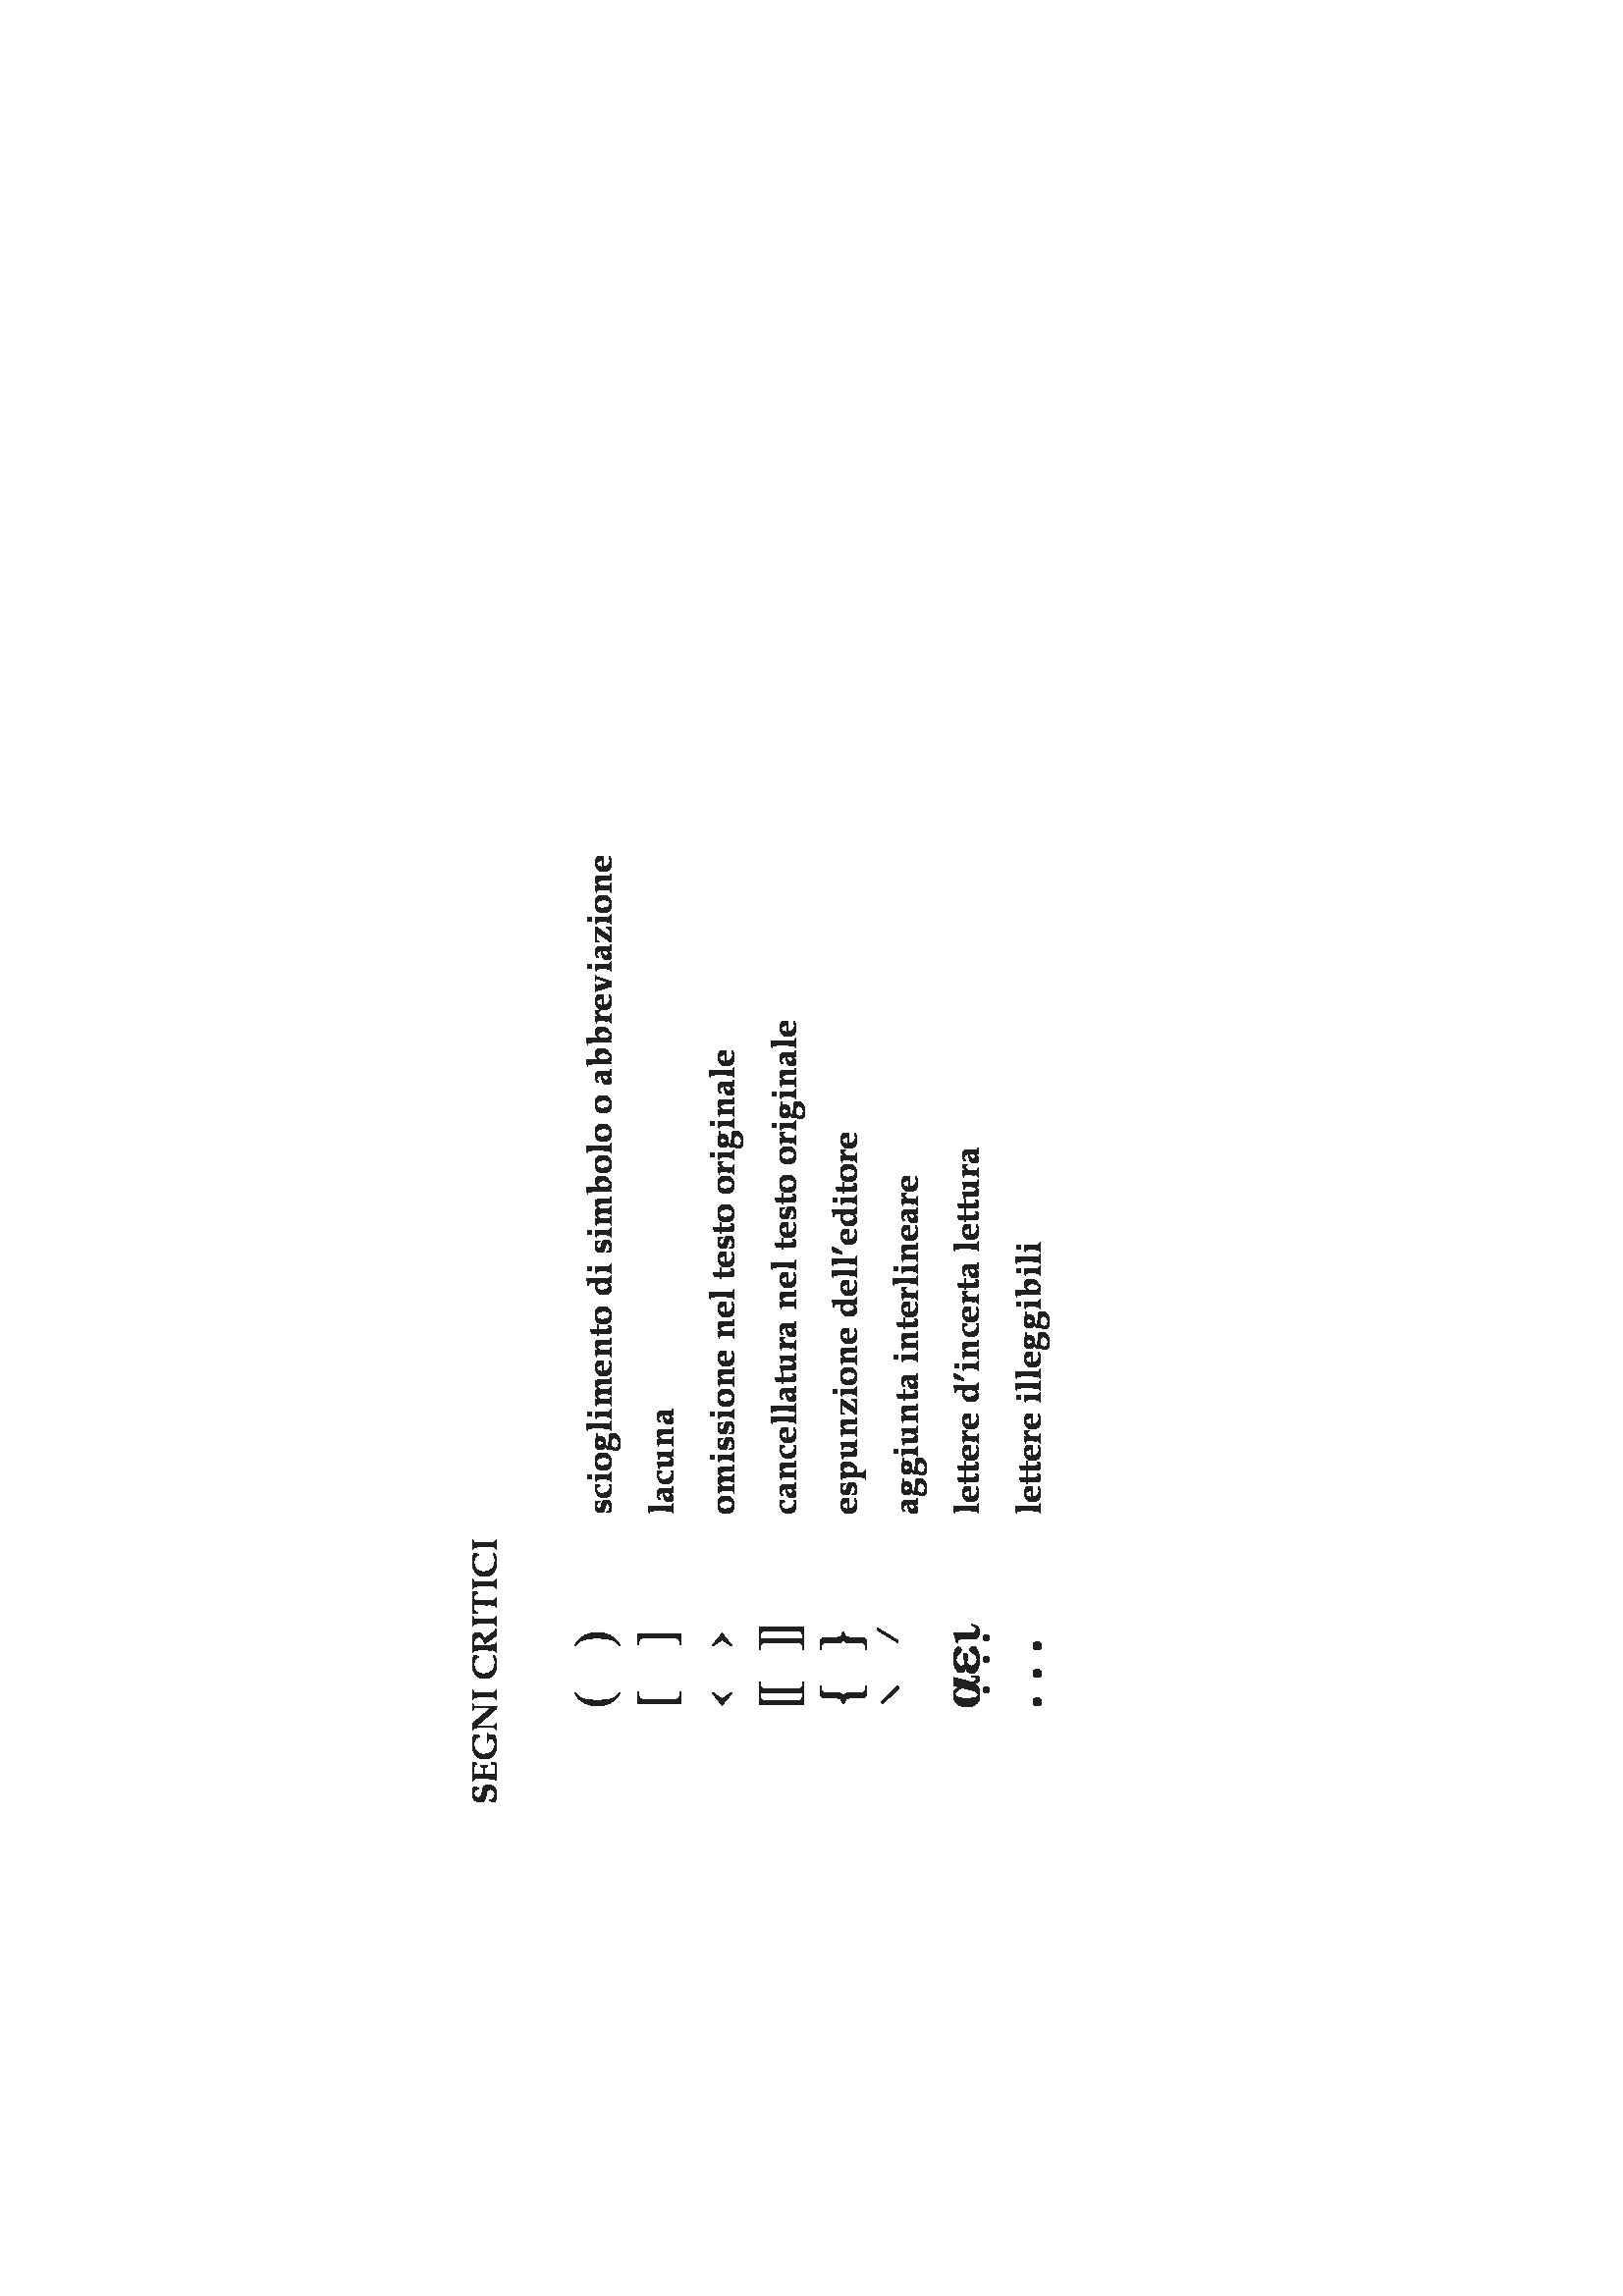 dispensa I. Andorlini Papirologia